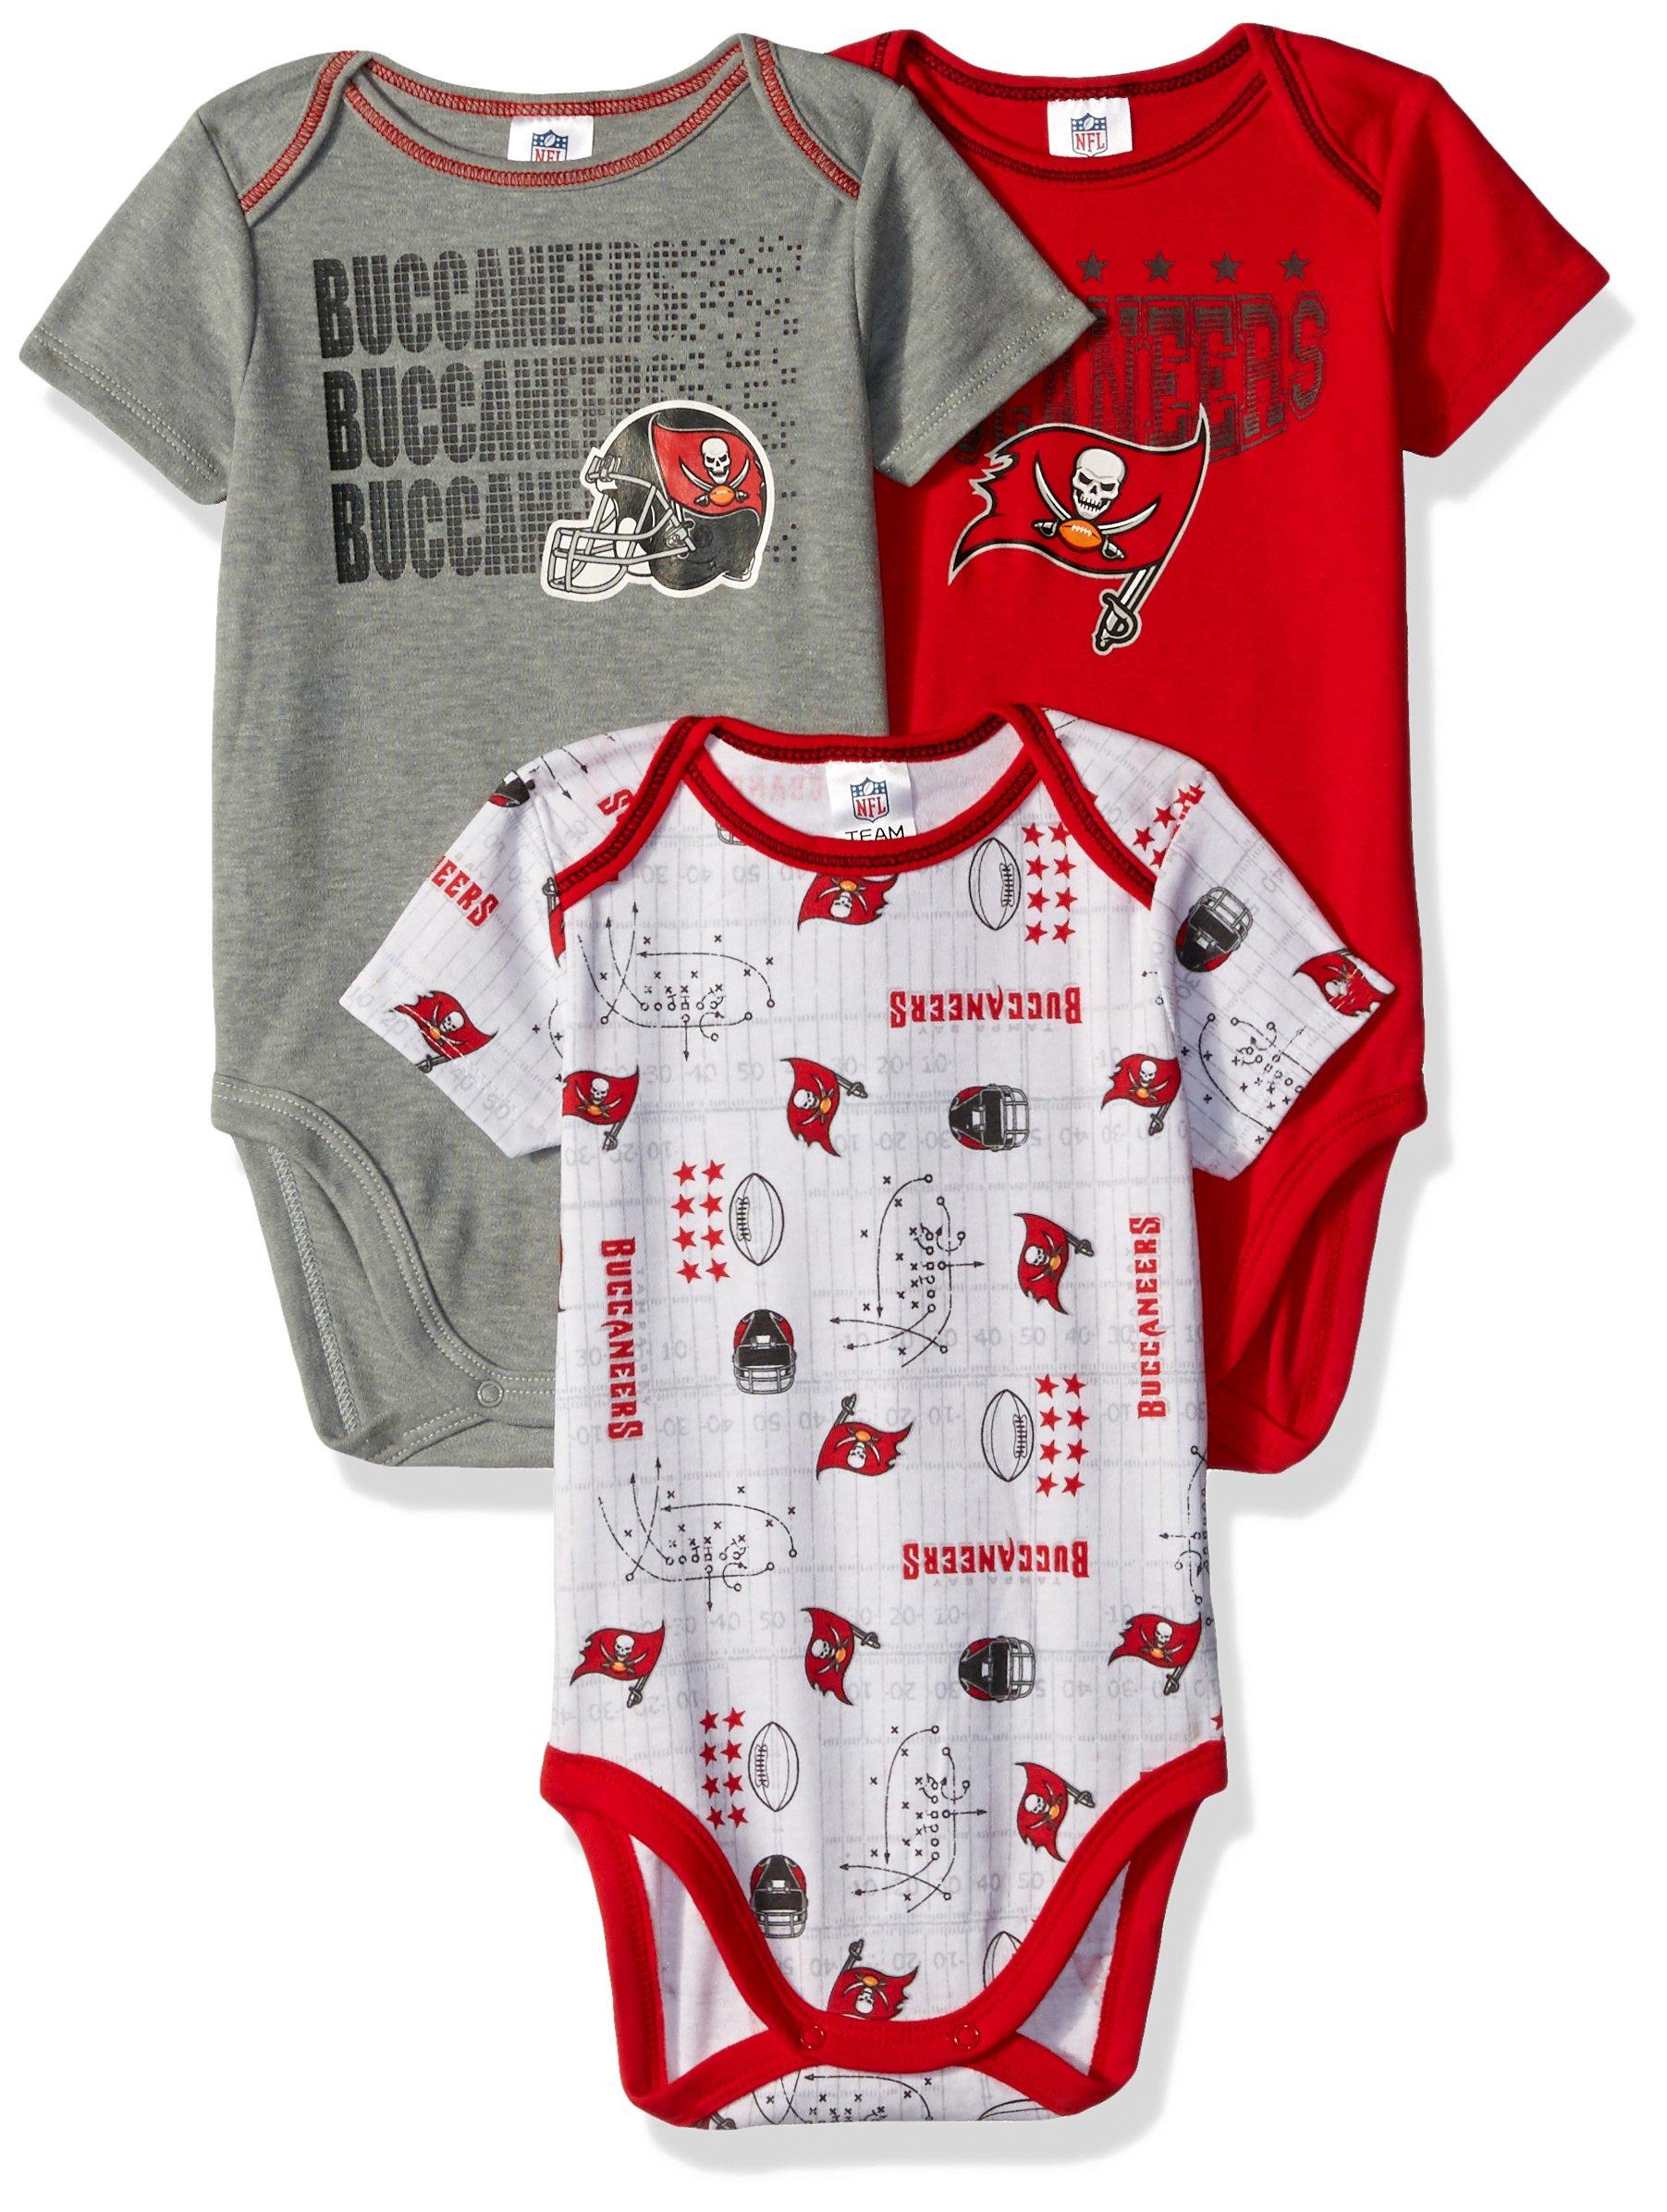 53e614361 Amazon.com  Tampa Bay Buccaneers NFL Football Newborn Baby ...